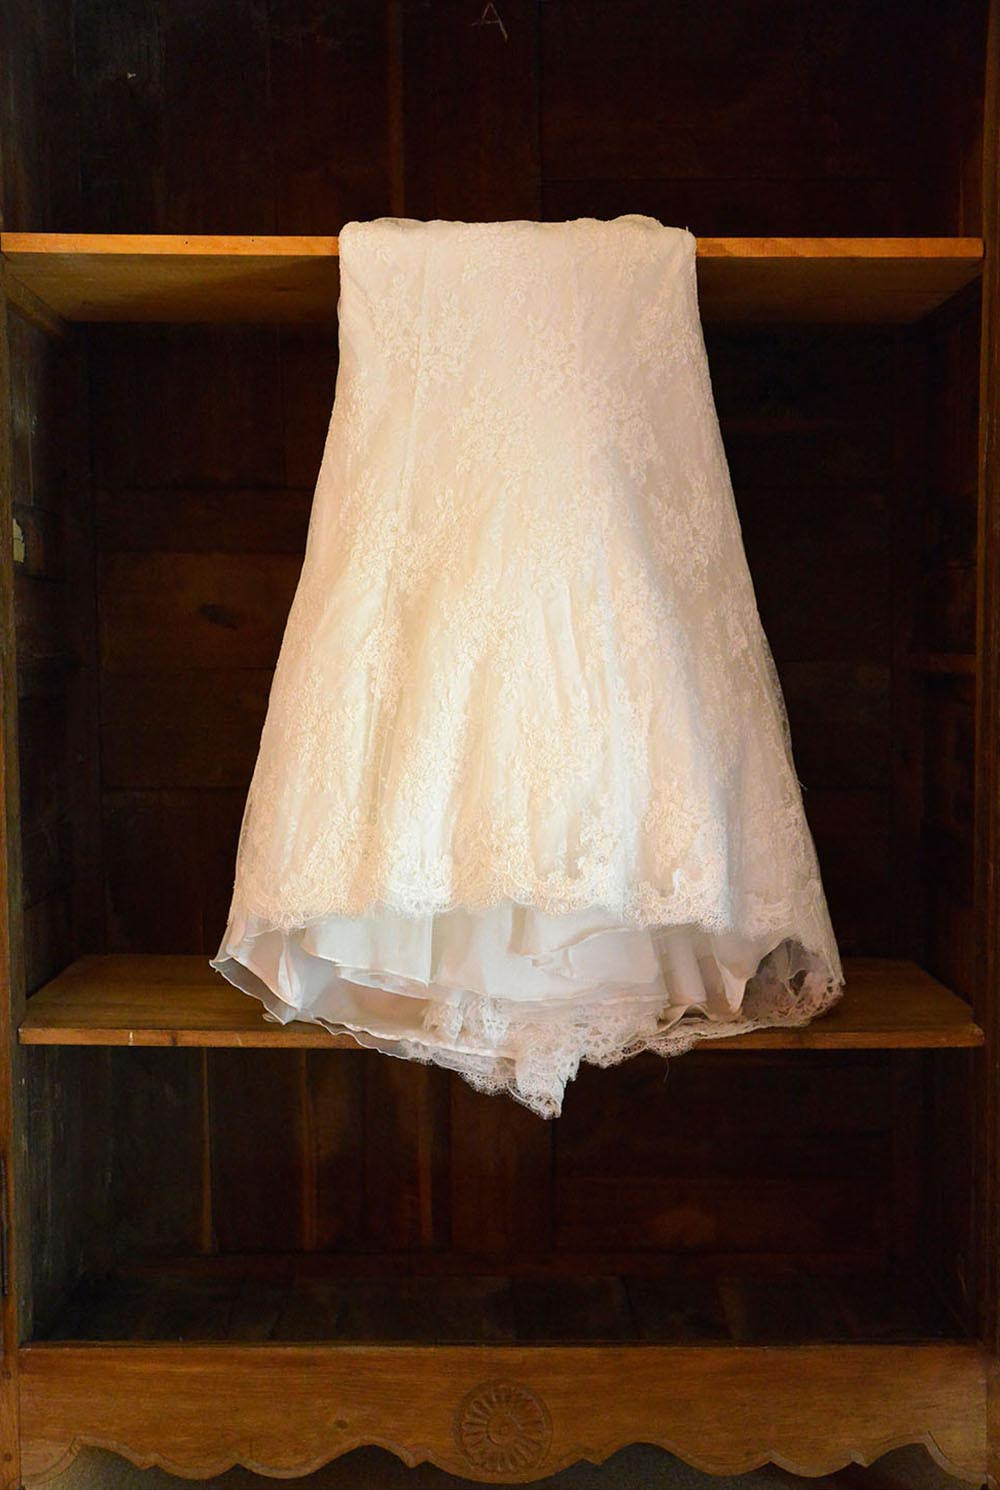 Robe de mariee sur penderie